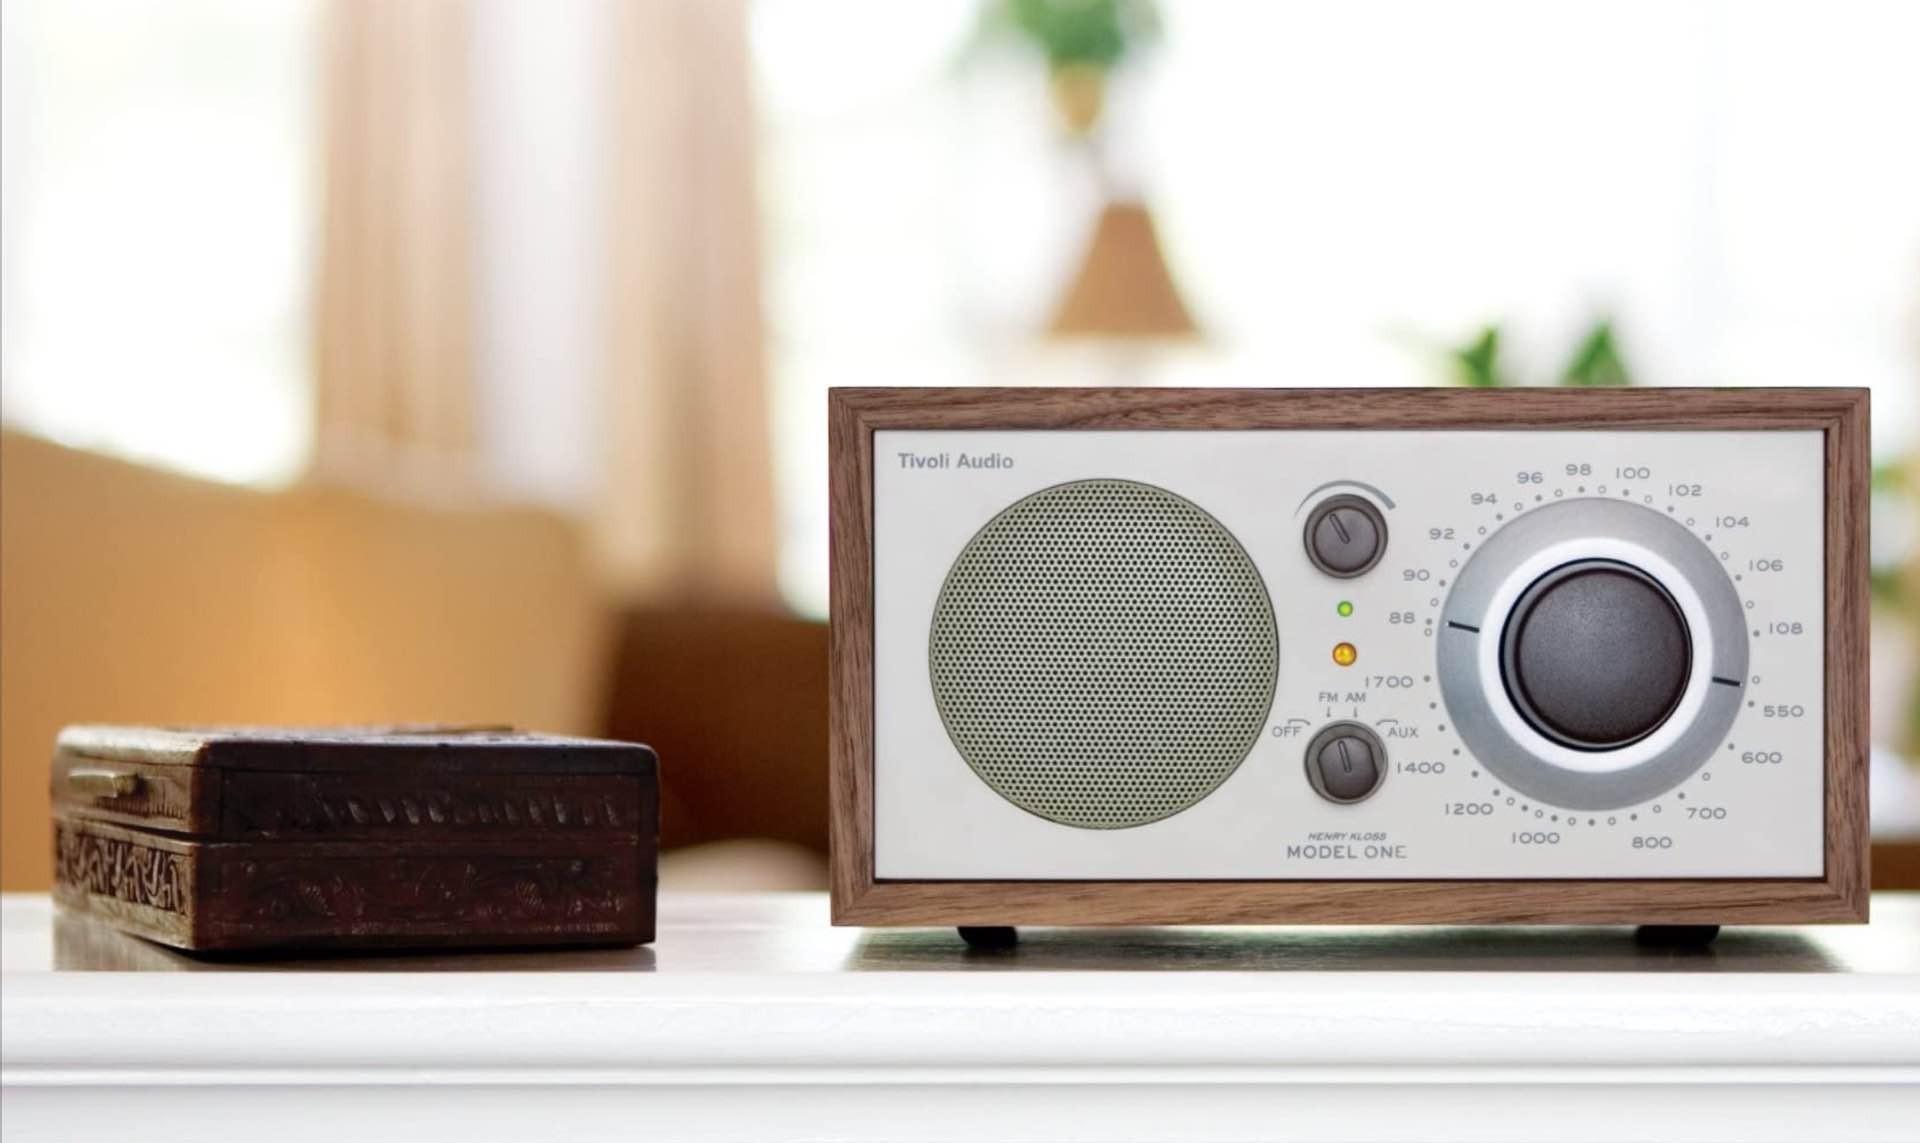 tivoli-audio-model-one-retro-am-fm-radio-2